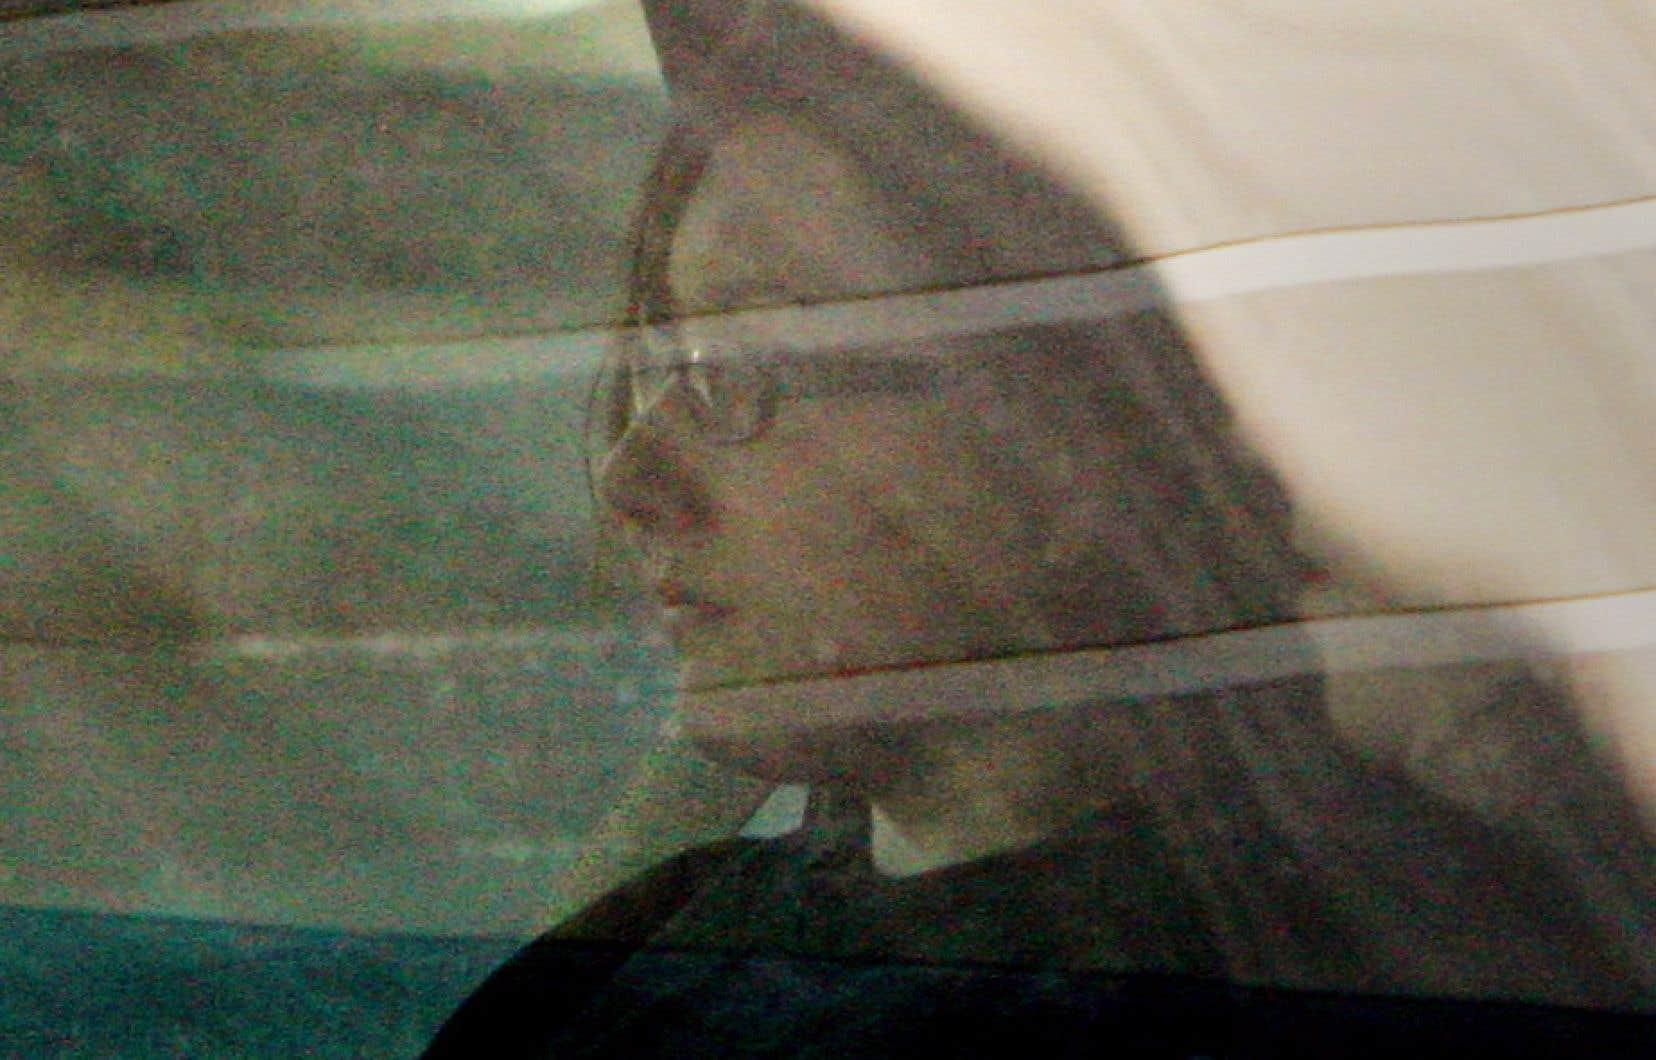 Terri-Lynne McClintic, photographiée en 2012